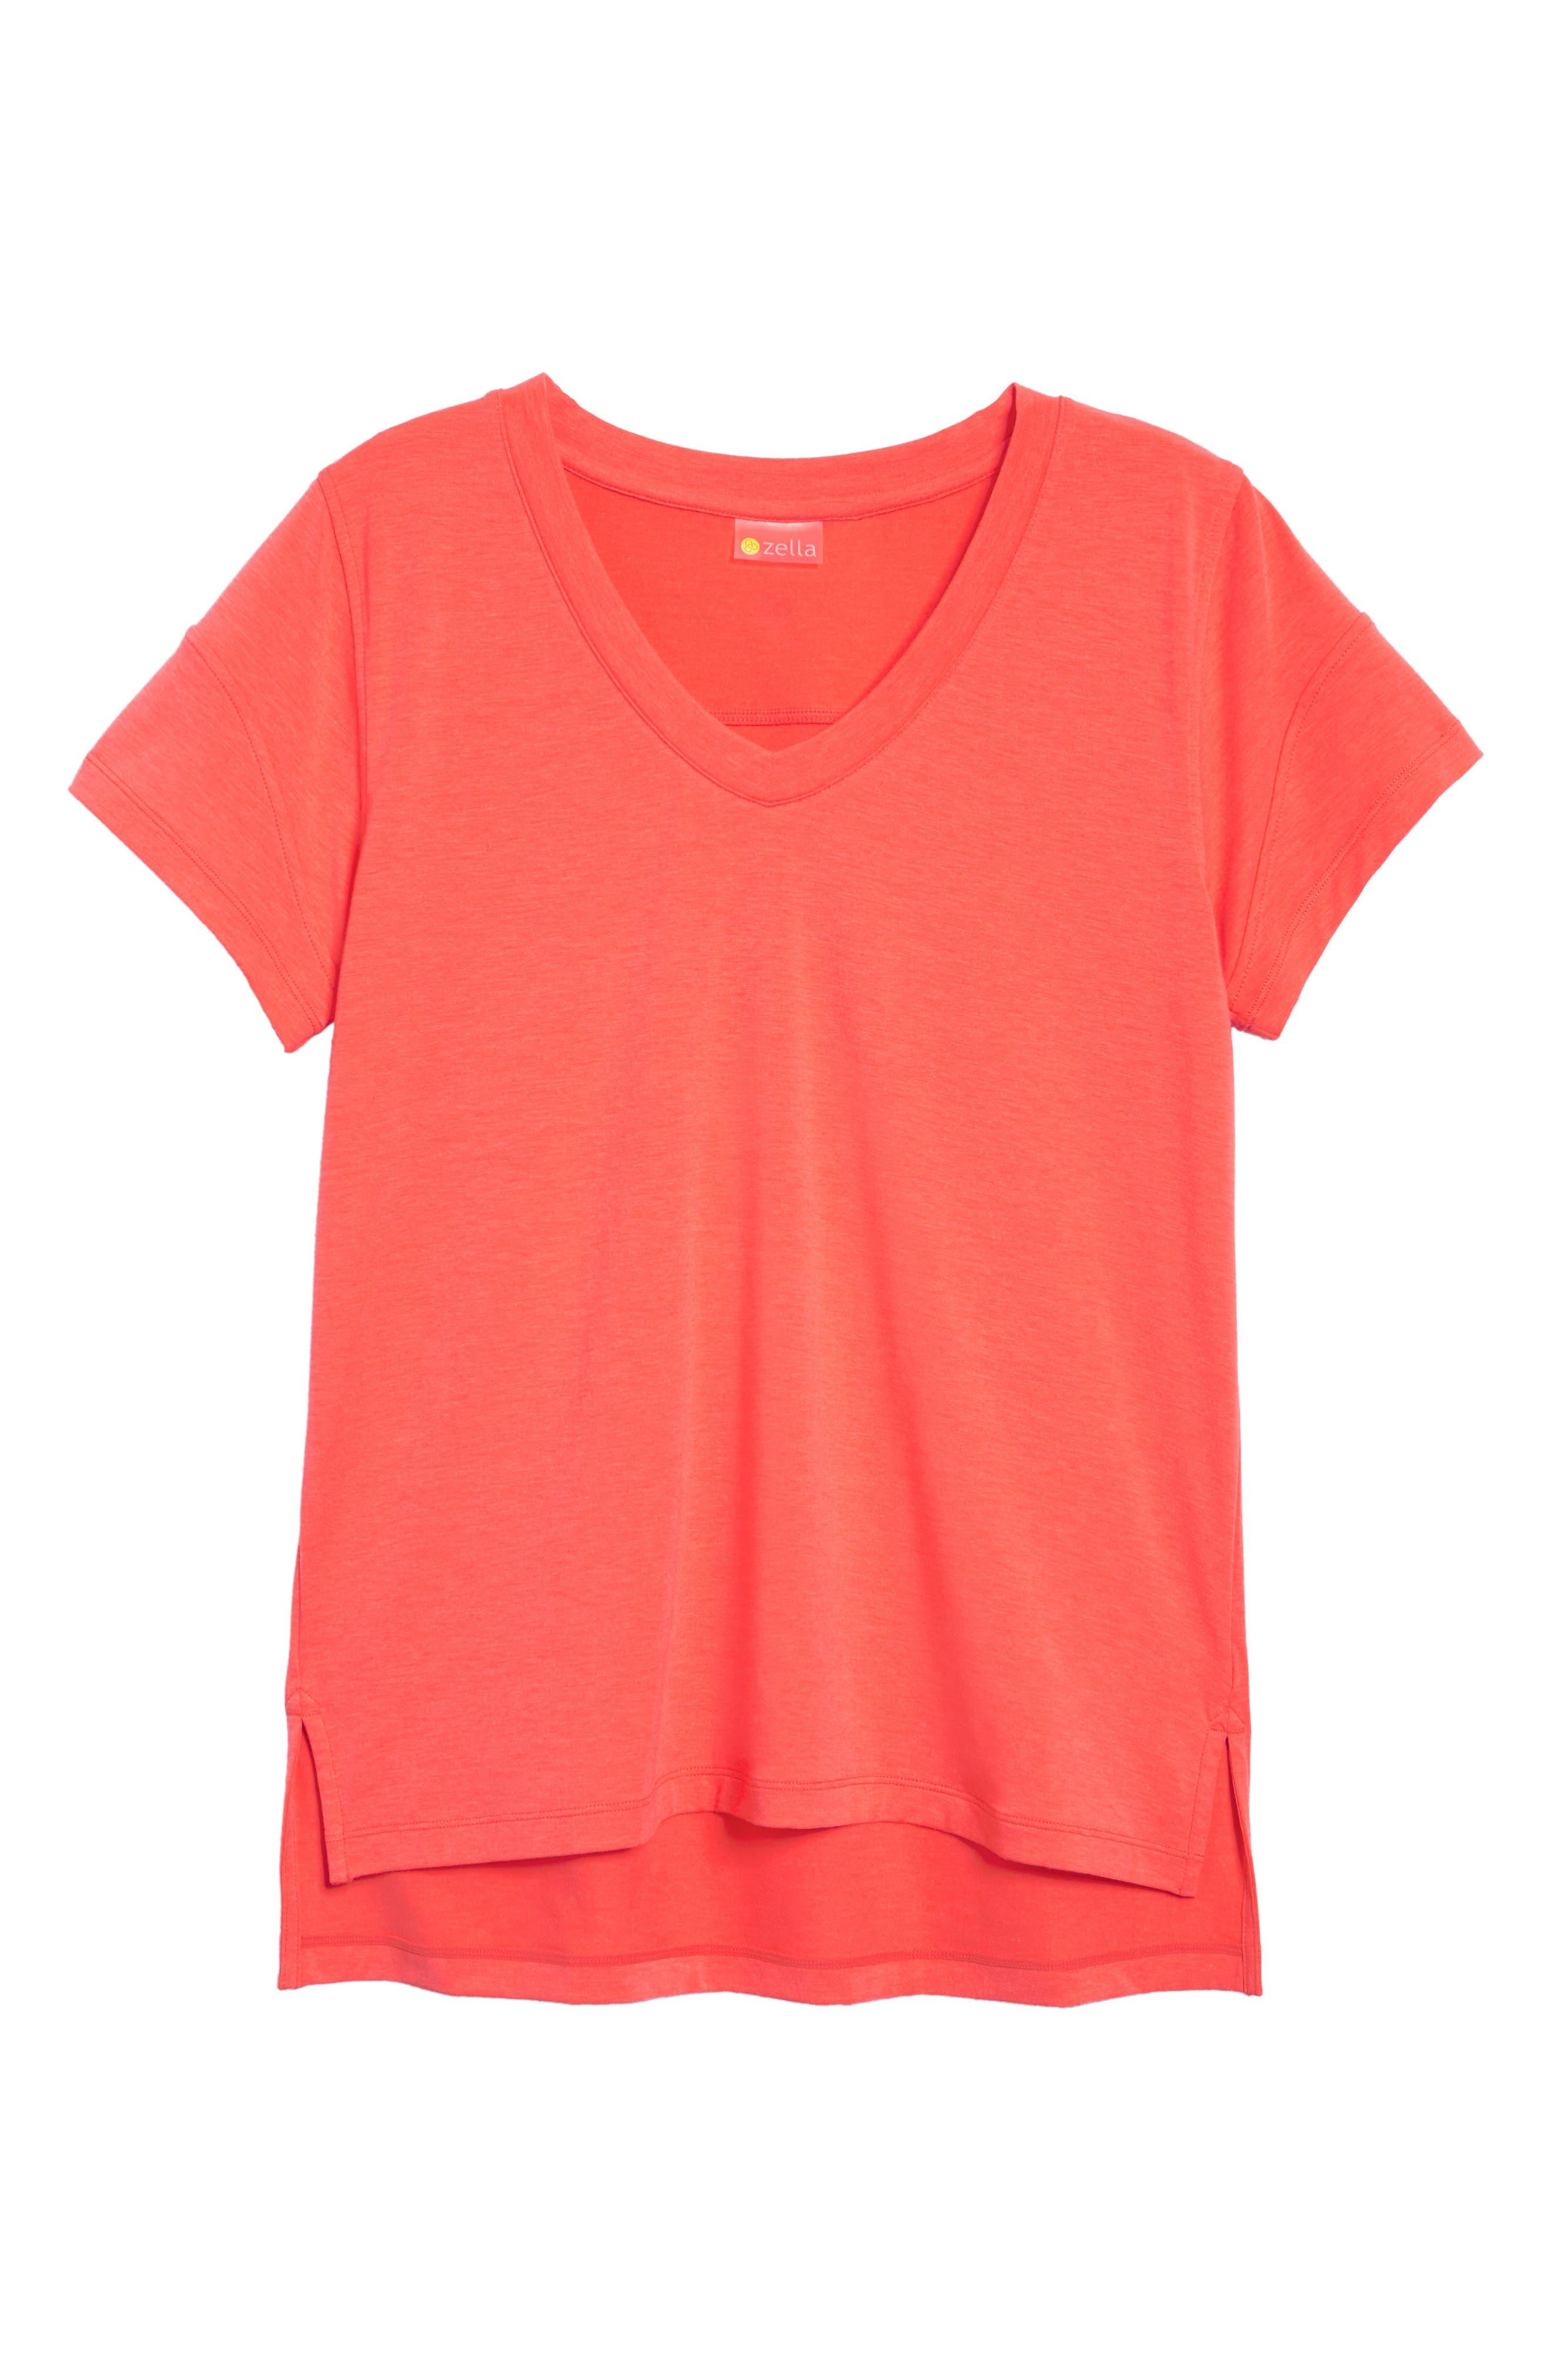 Got Salmon Womens Tee Shirt Pick Size Color Petite Regular